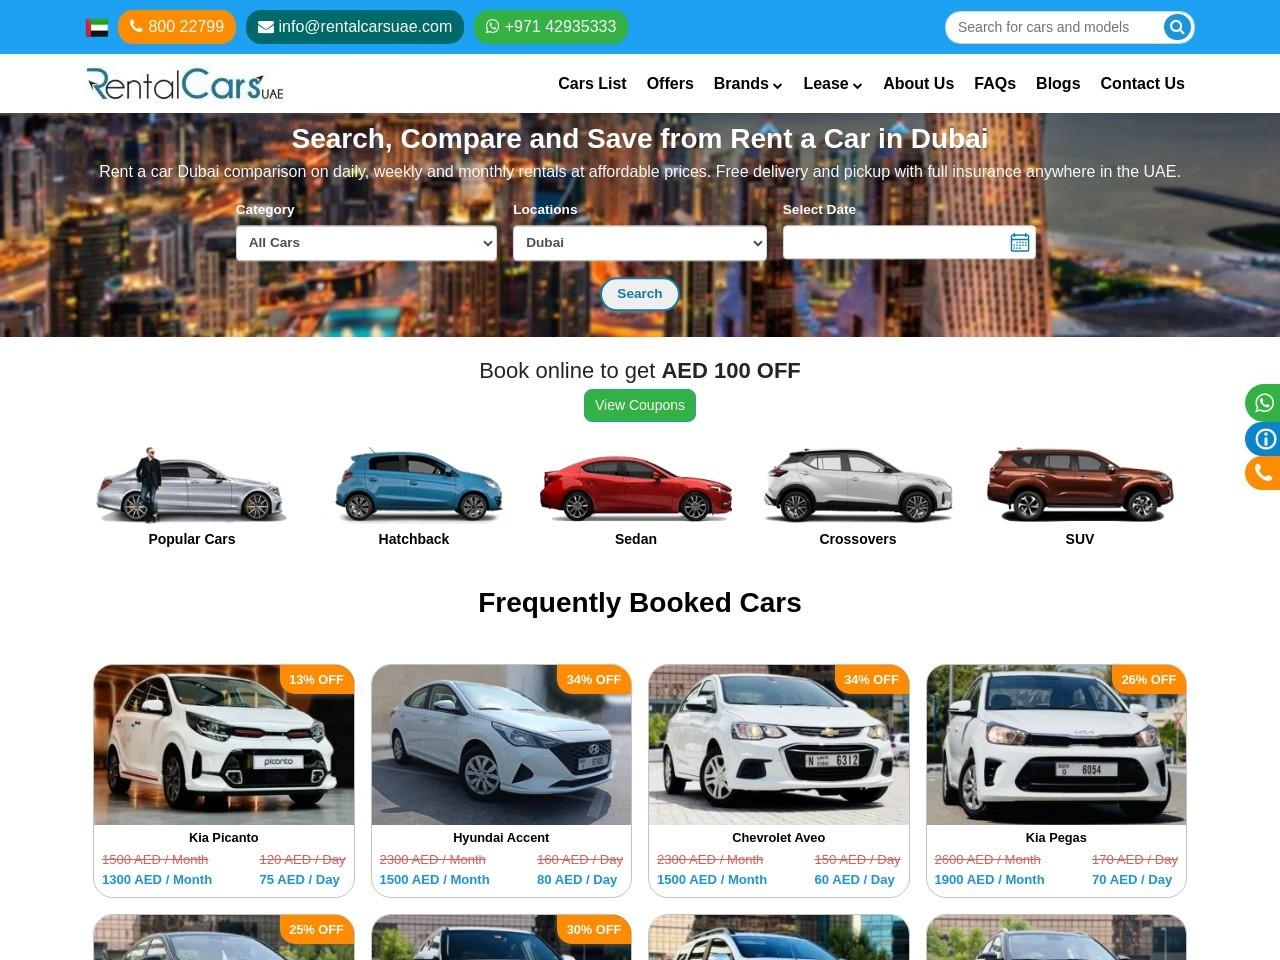 Rent a Car Al-Qusais/ Rental Cars UAE